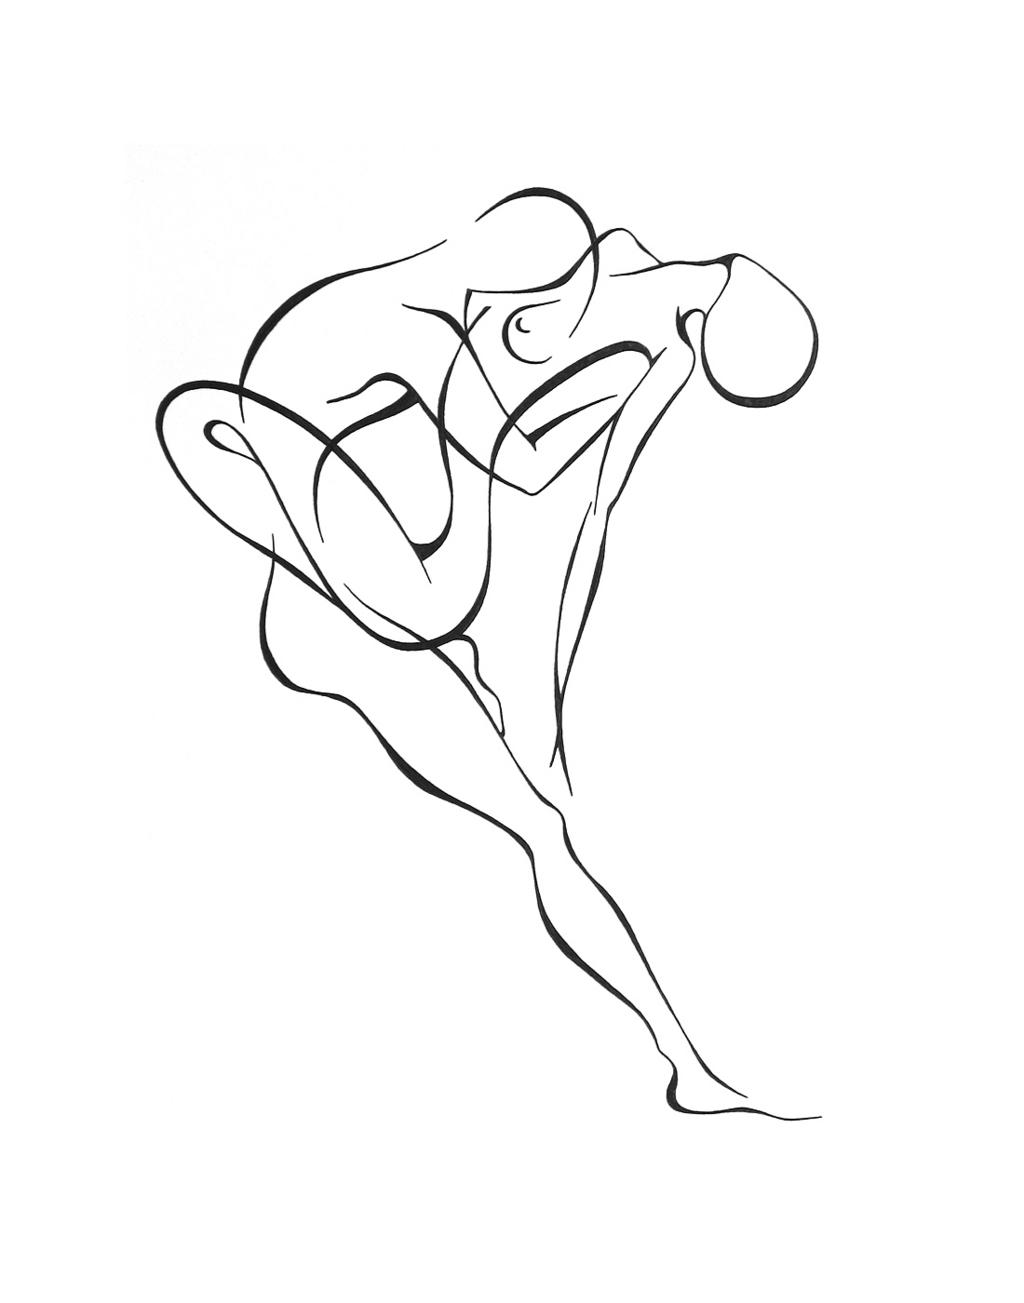 1024x1303 Lyudmila Kogan Artwork Passion 2 Original Drawing Pen